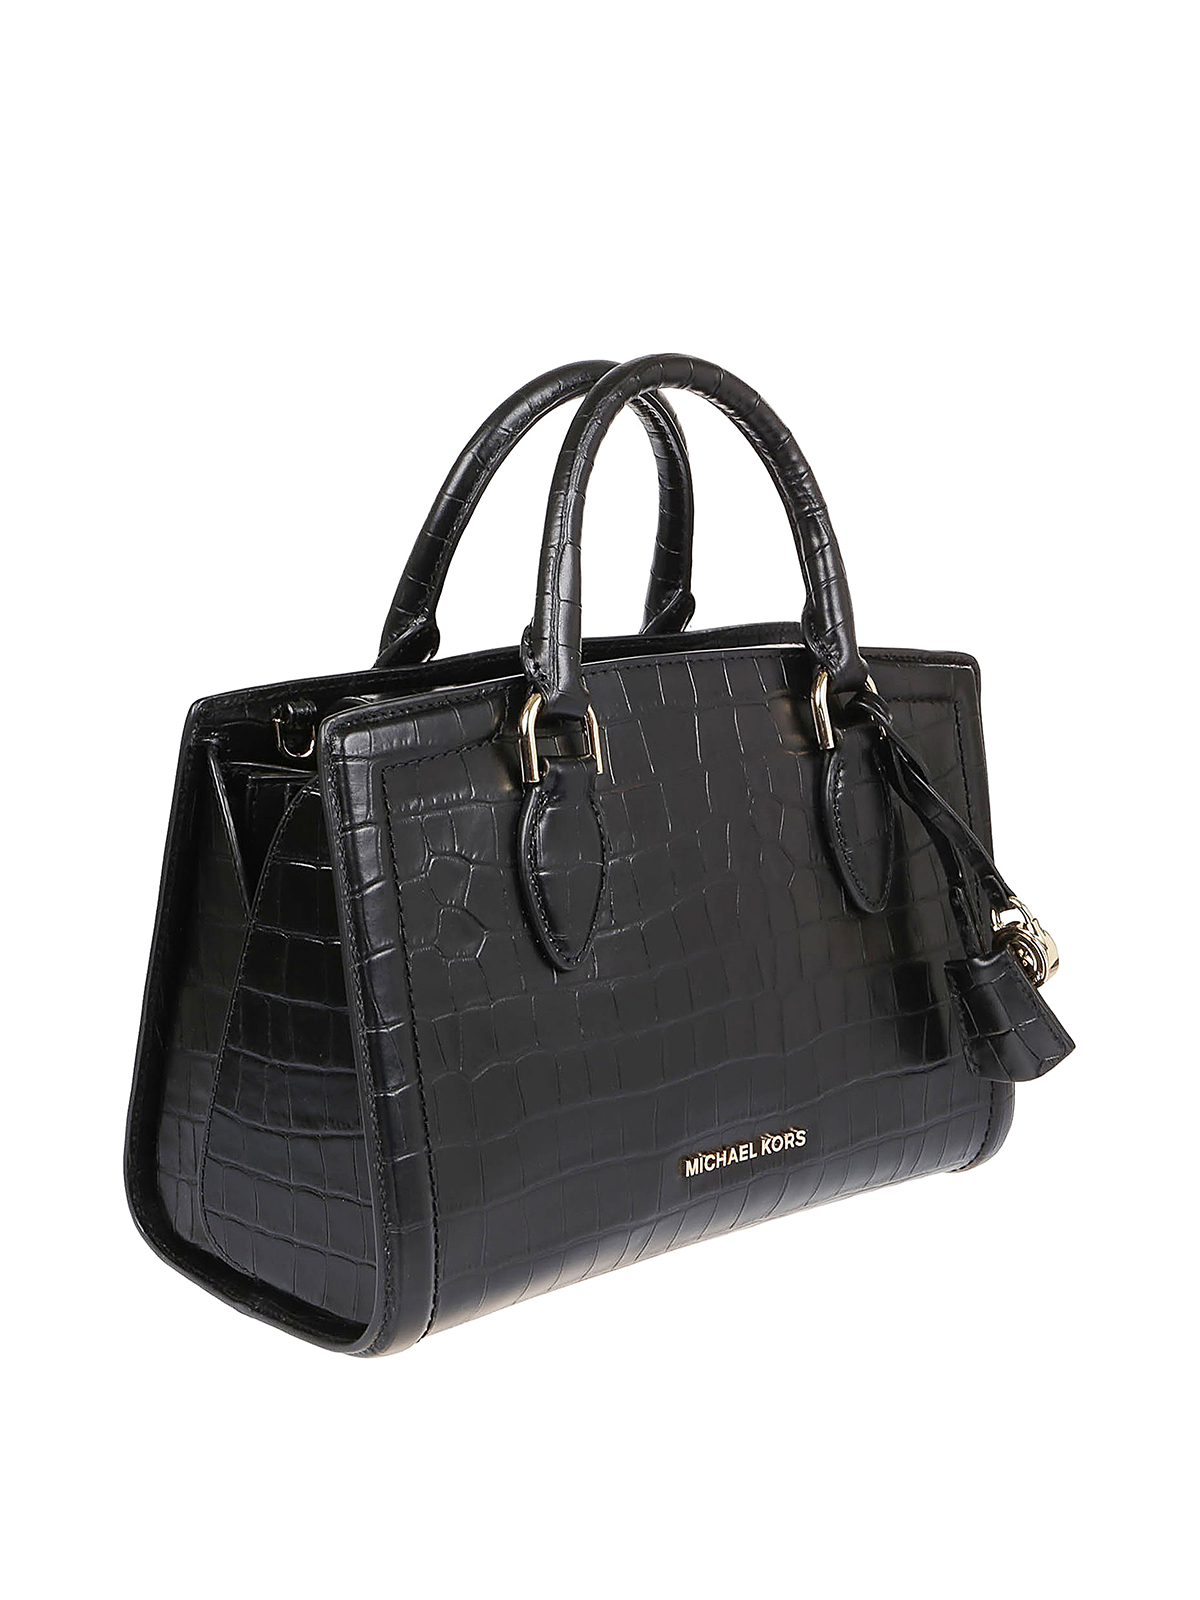 Michael Kors - Zoe M black croco print leather bowling bag - totes ...